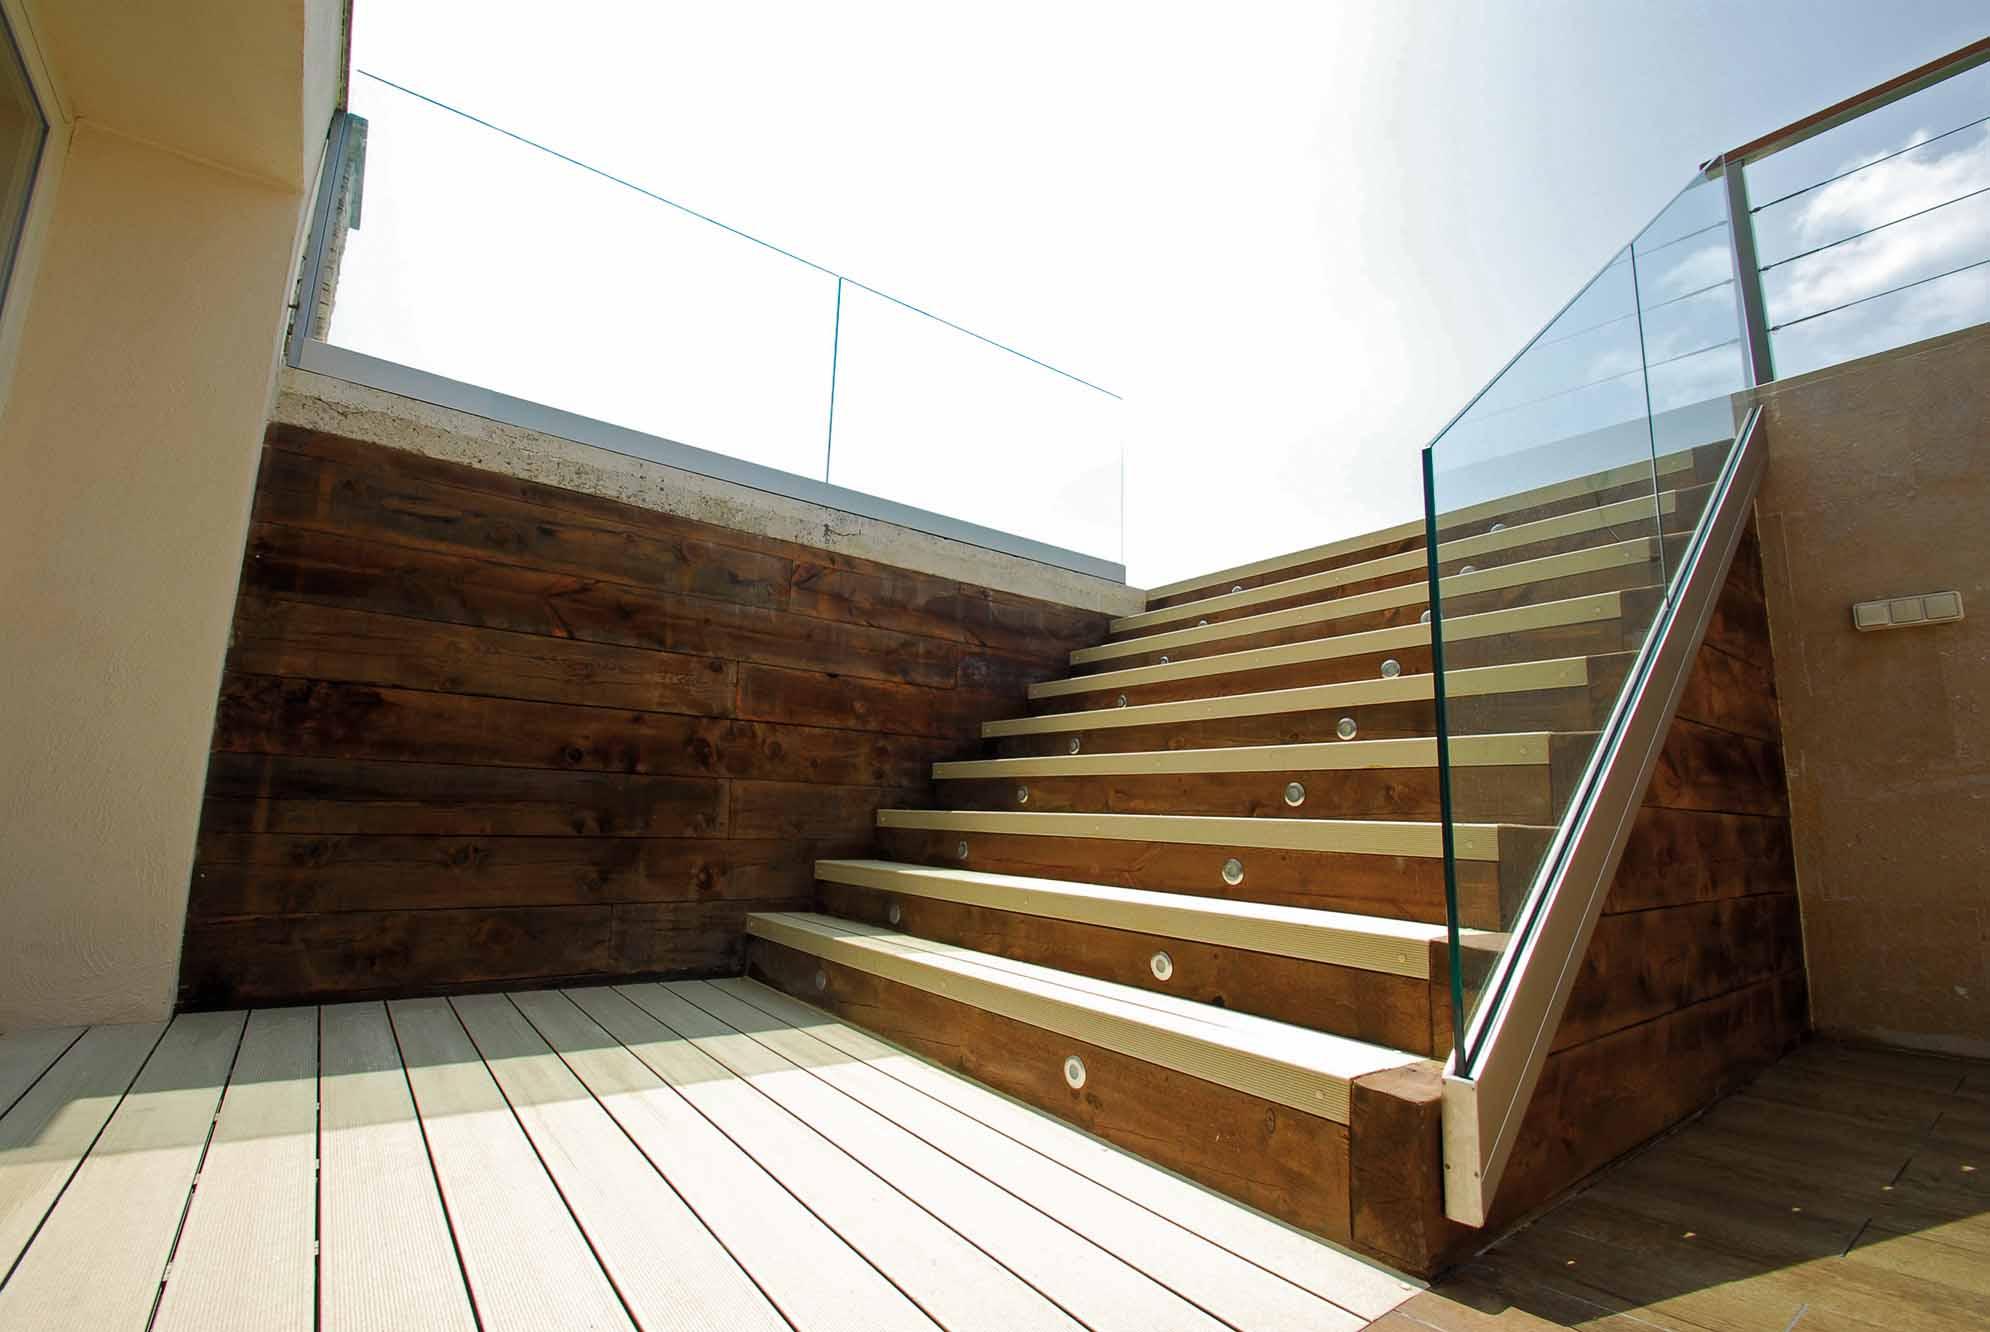 muro-contencion-traviesas-madera-7